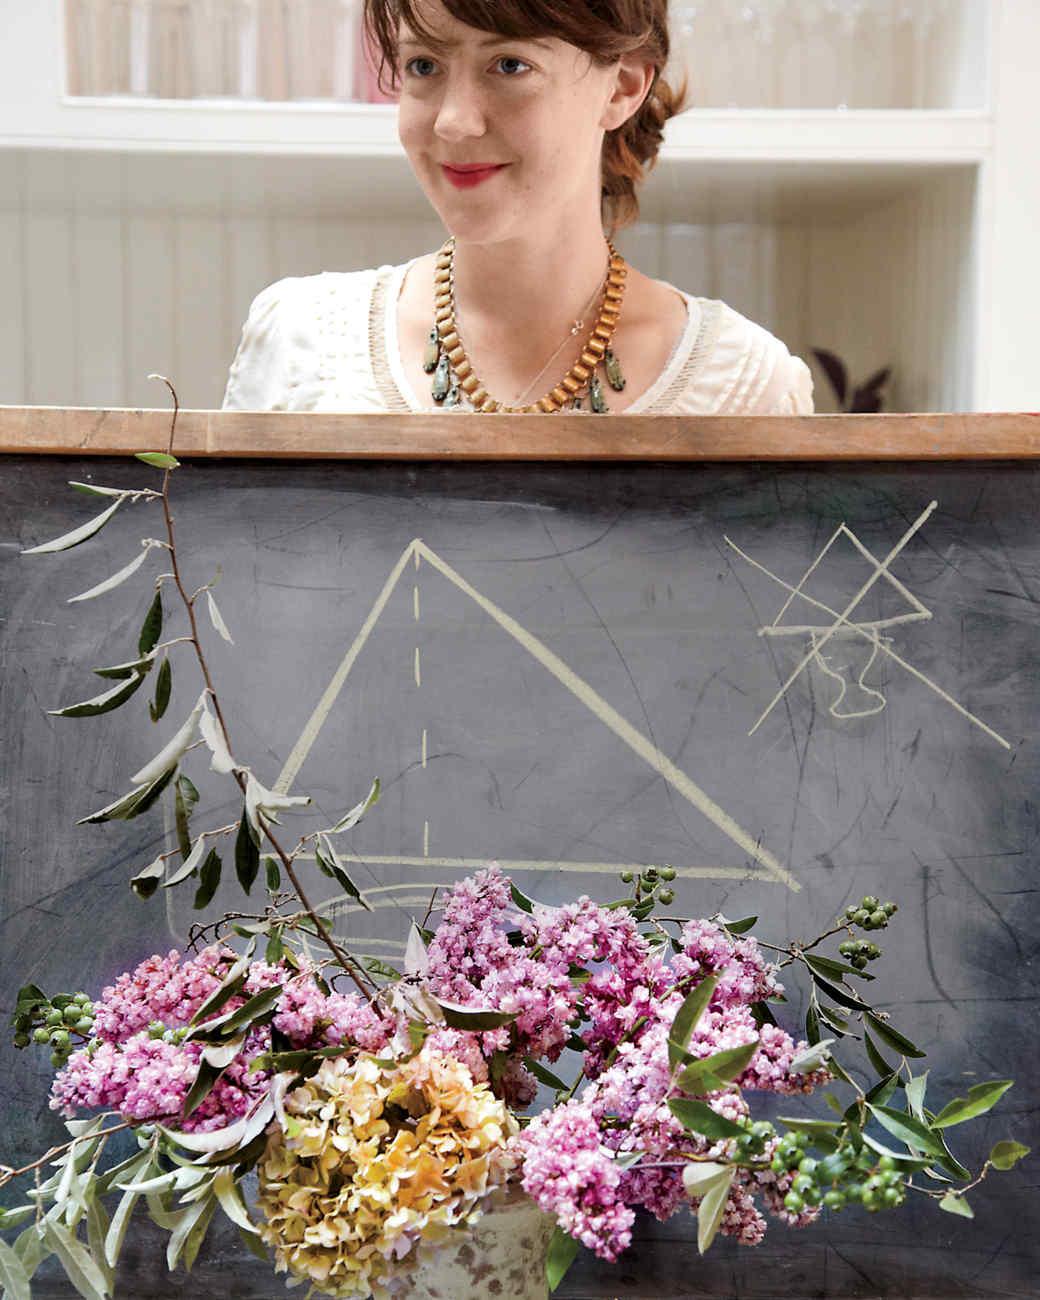 student-flowers-mld107663.jpg